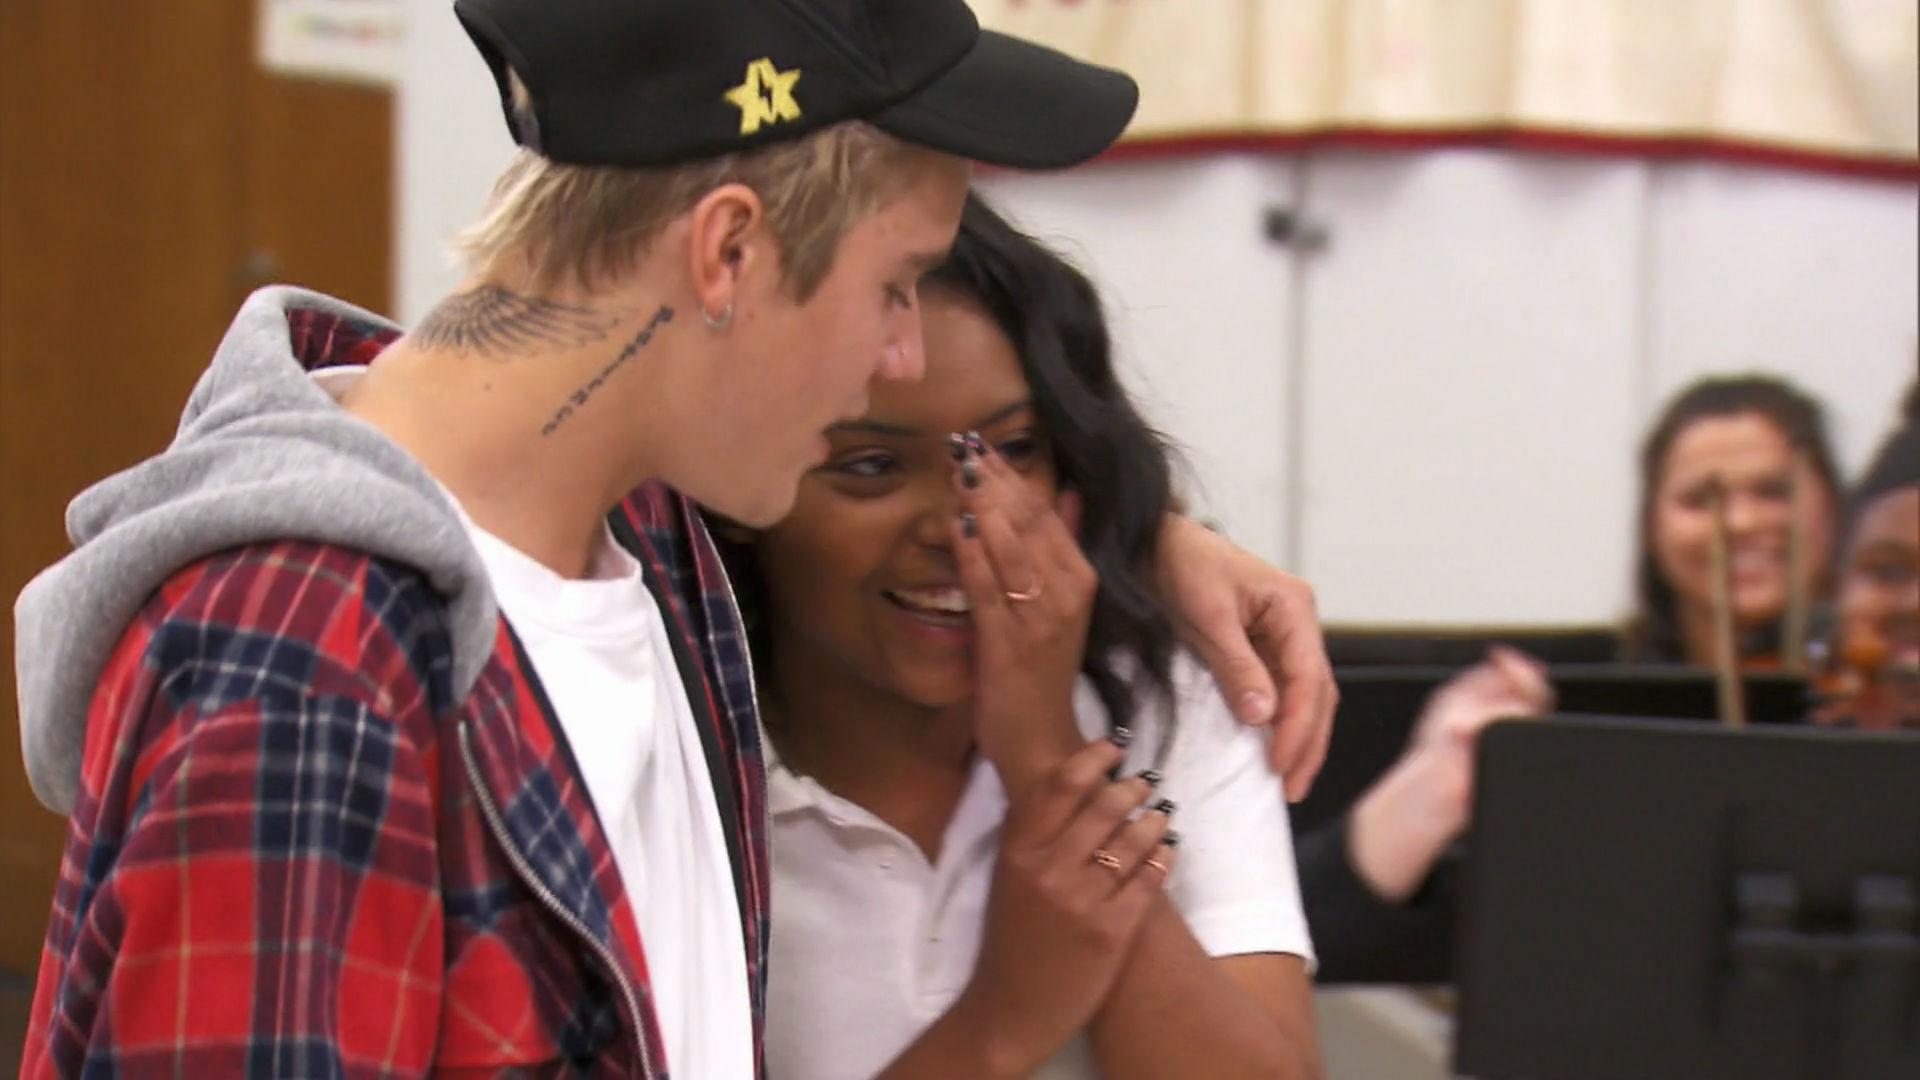 Justin Bieber Sings with a Fan at the 2016 RDMA | Radio Disney Music Awards | Radio Disney